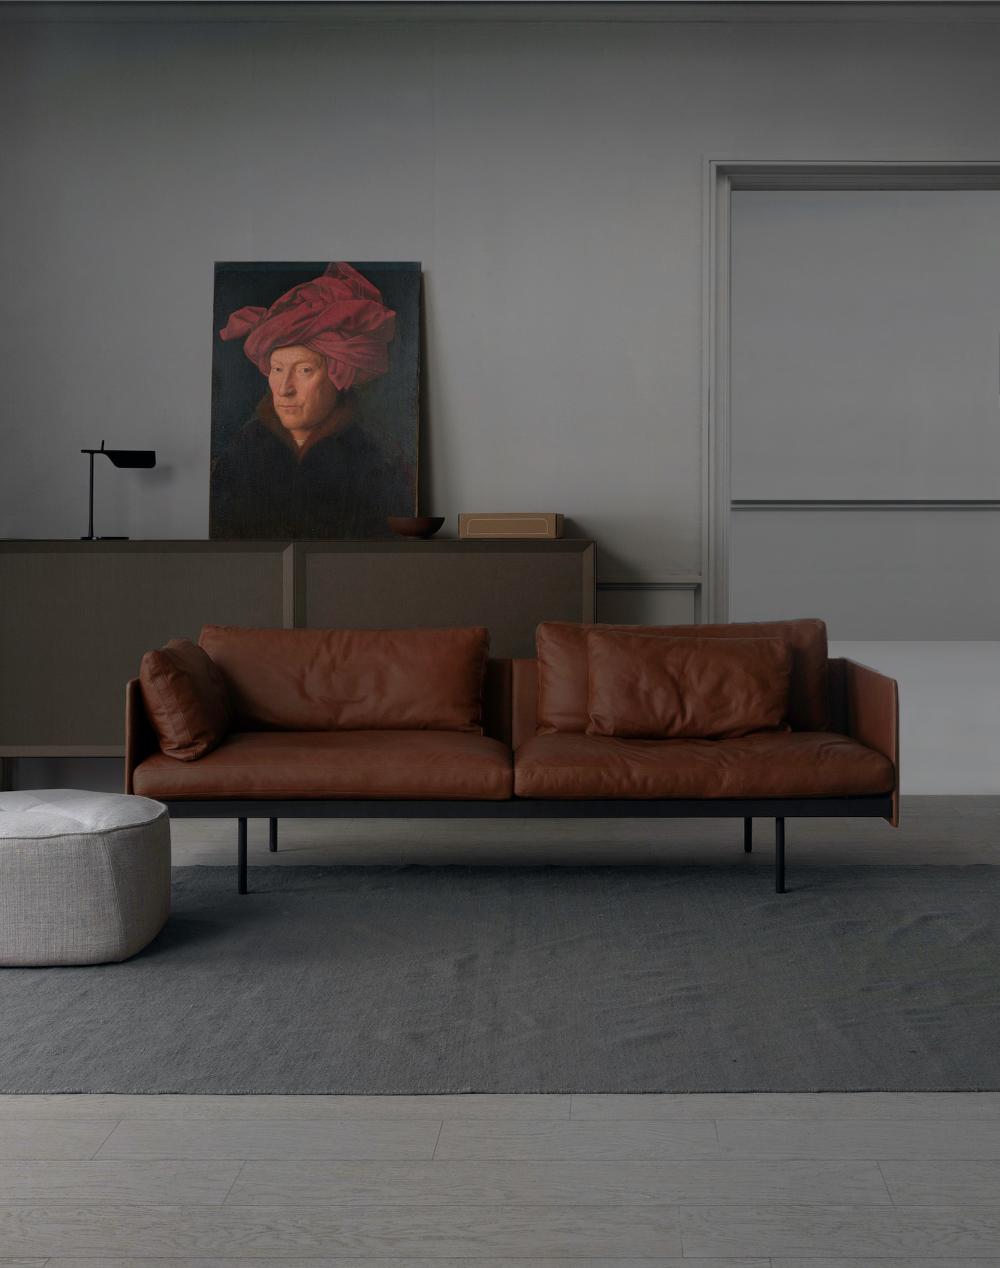 Bureau Minimalist Sofa Sofa Design Couch Design